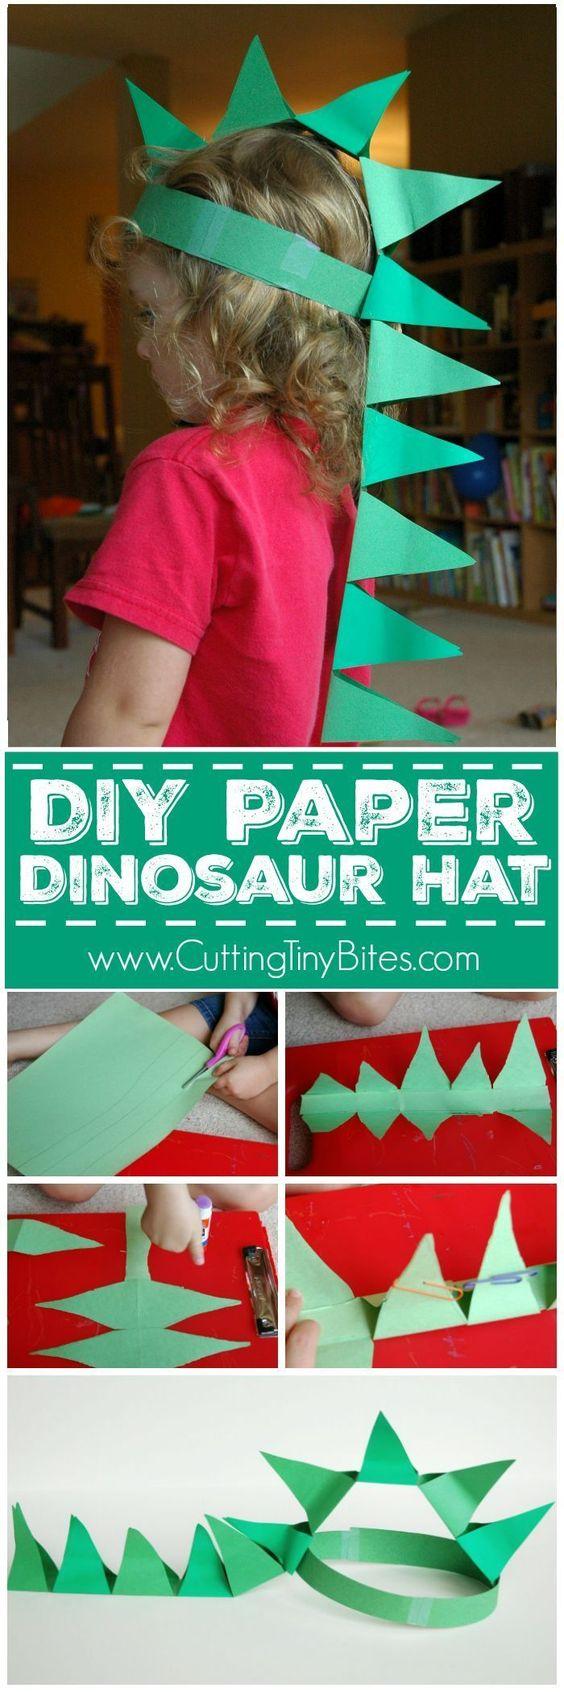 DIY Paper Dinosaur Hat Costume.